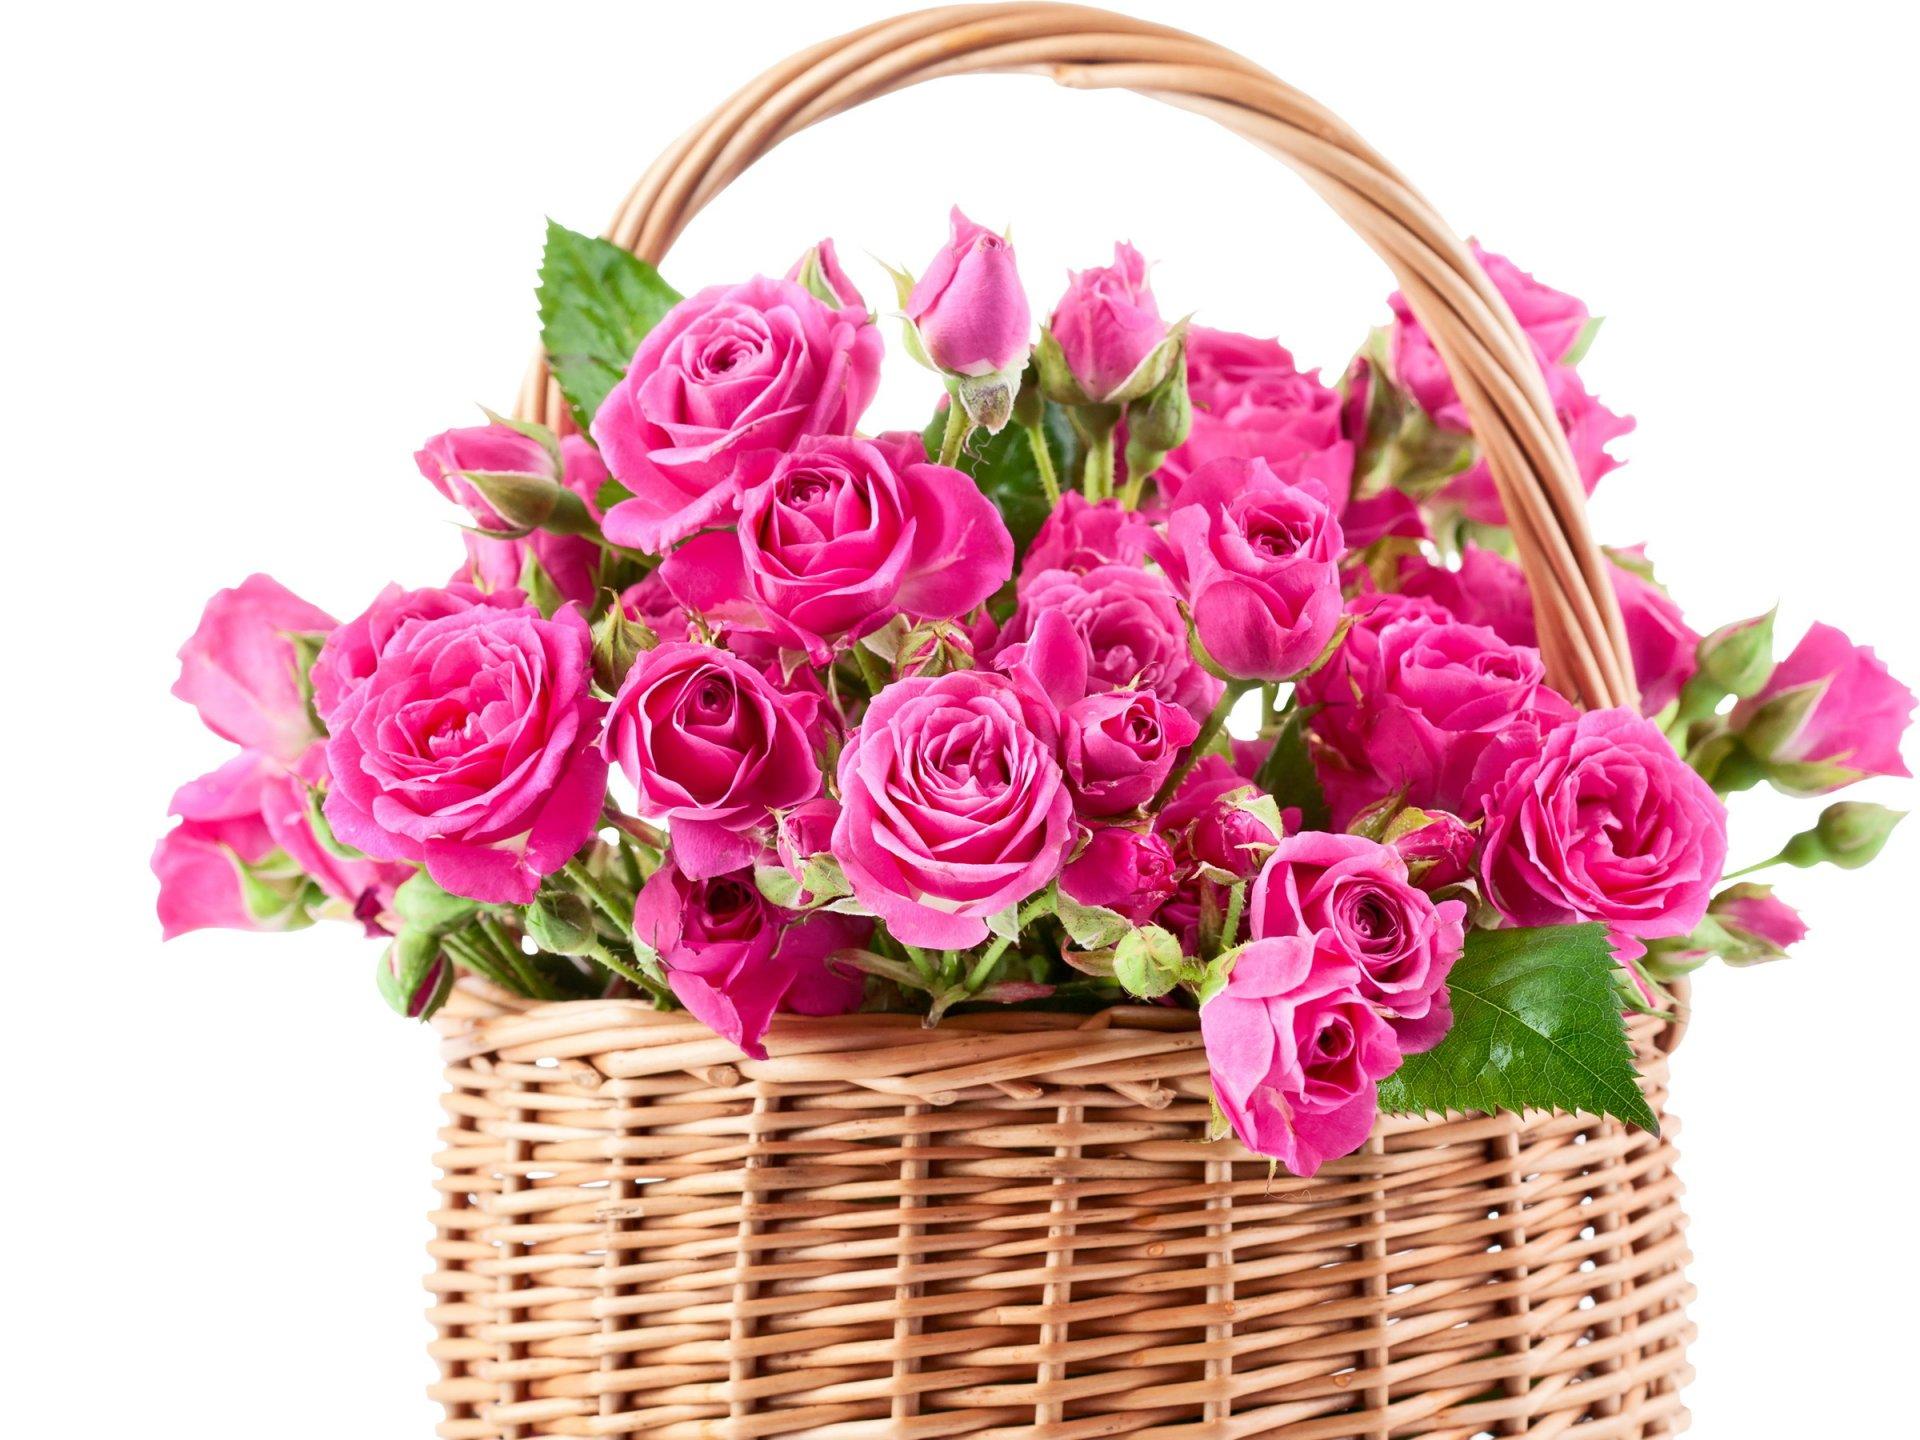 четырем картинки корзина цветов для тебя жизнь